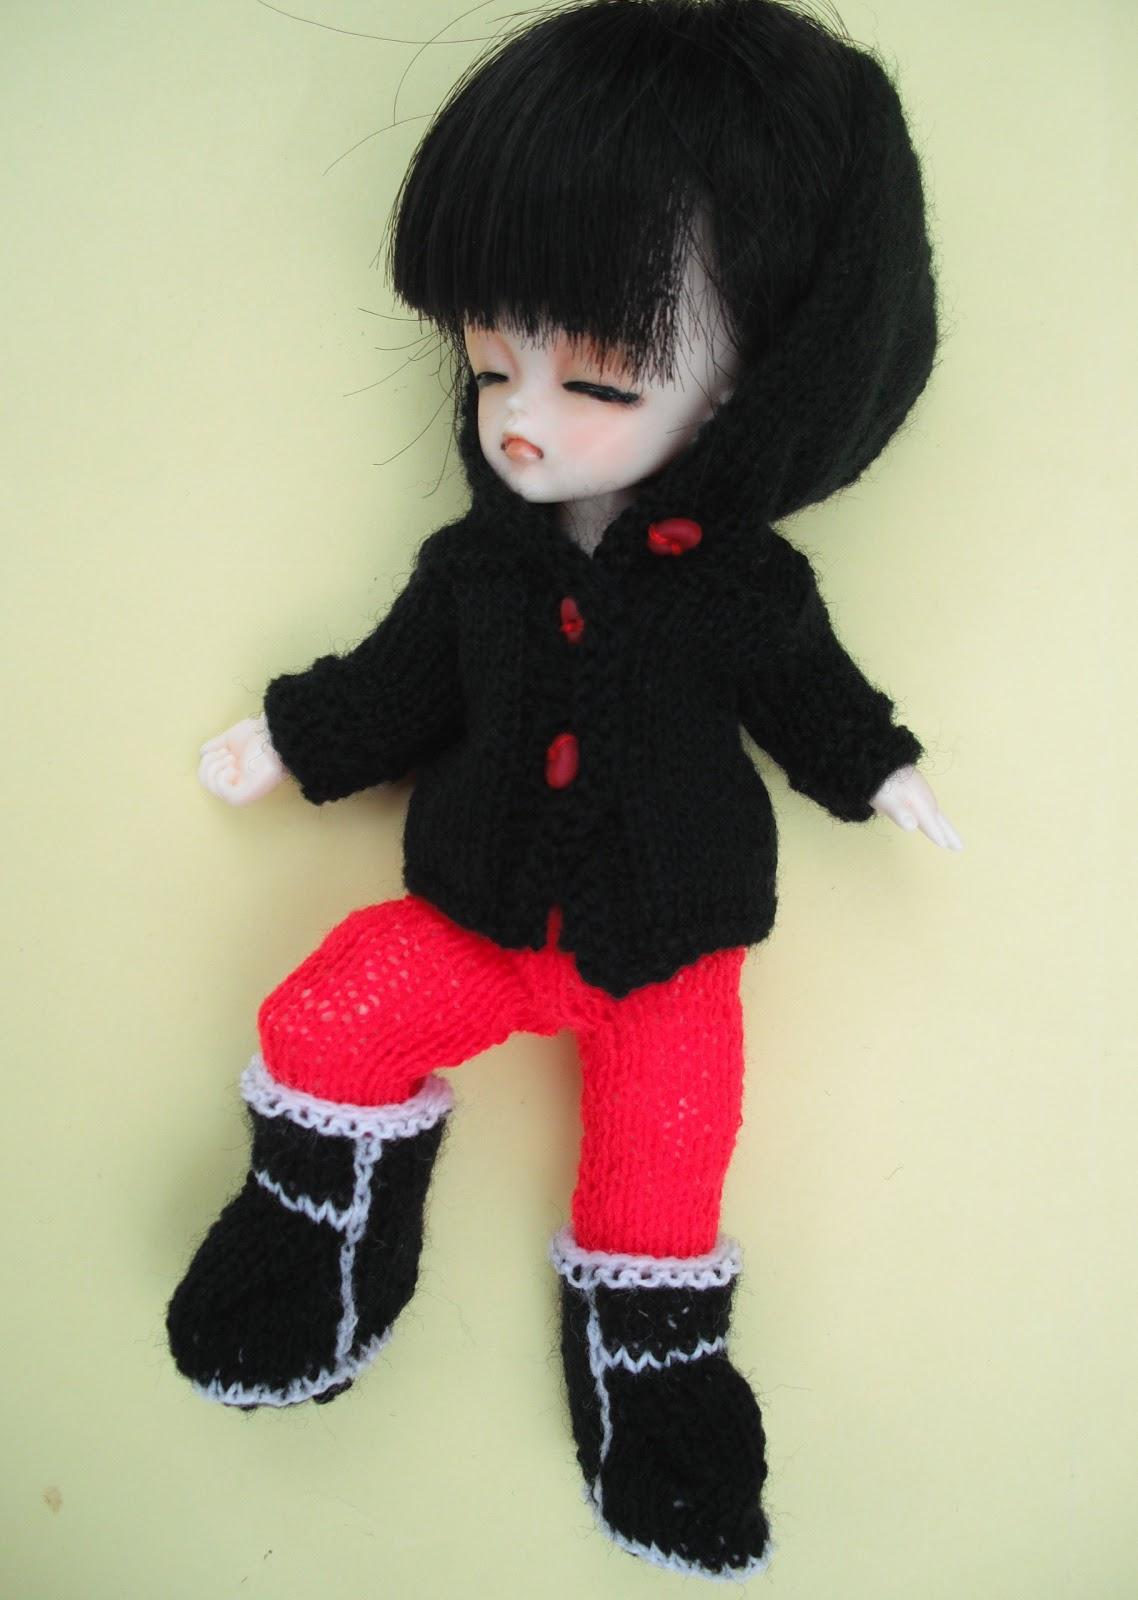 bitstobuy: Free knitting pattern for \'Ugg\' boots for tiny bjd